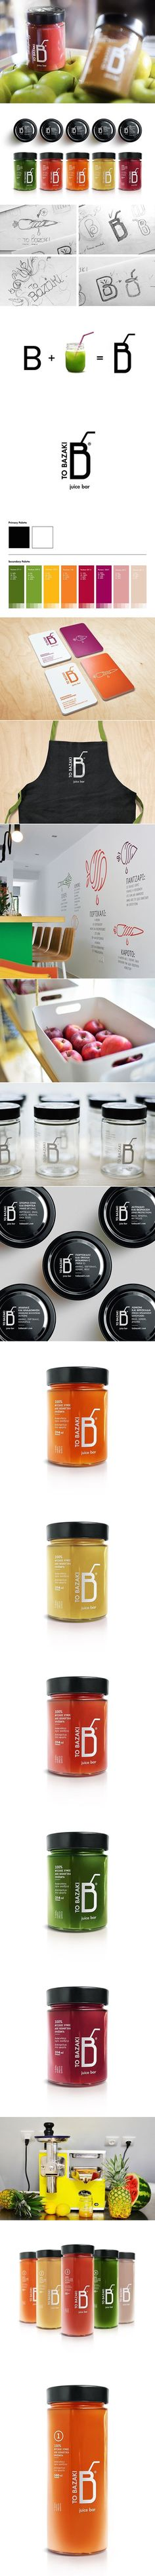 """TO BAZAKI"" Juice Bar – Design Identity. Designed by George Probonas."